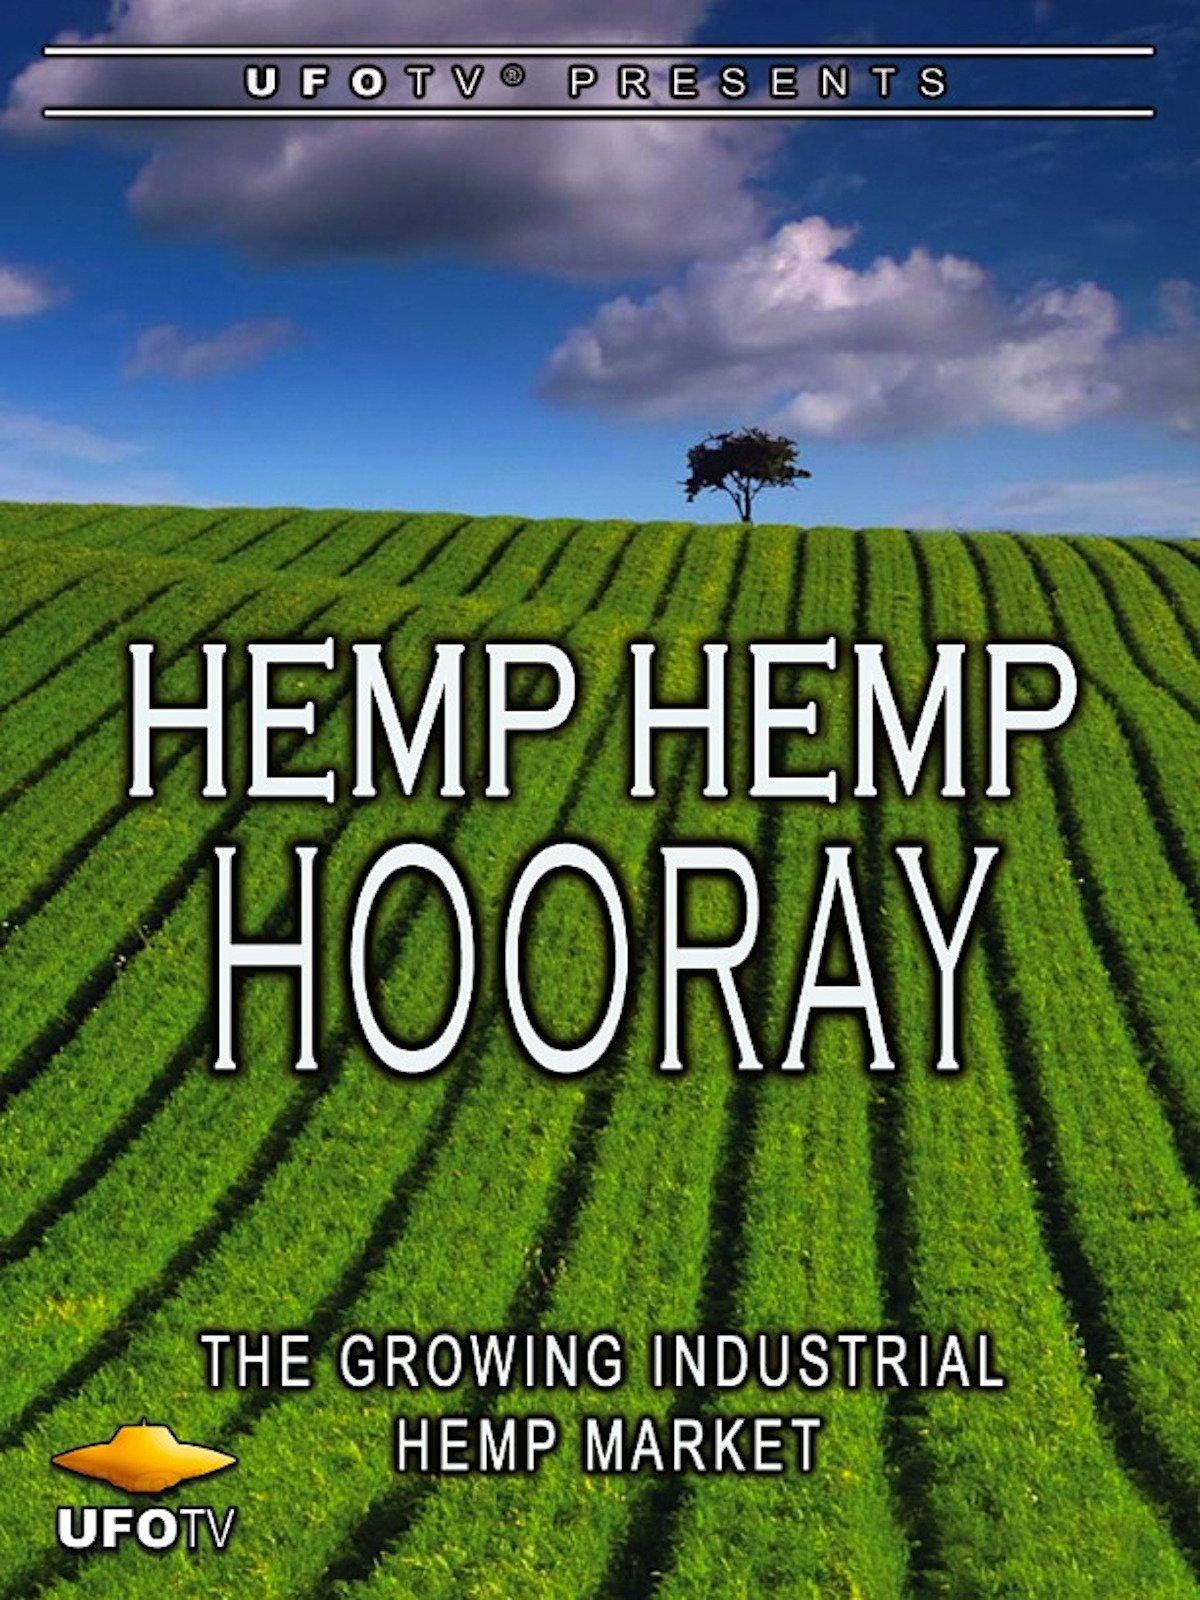 Hemp Hemp Hooray – The Growing Industrial Hemp Market